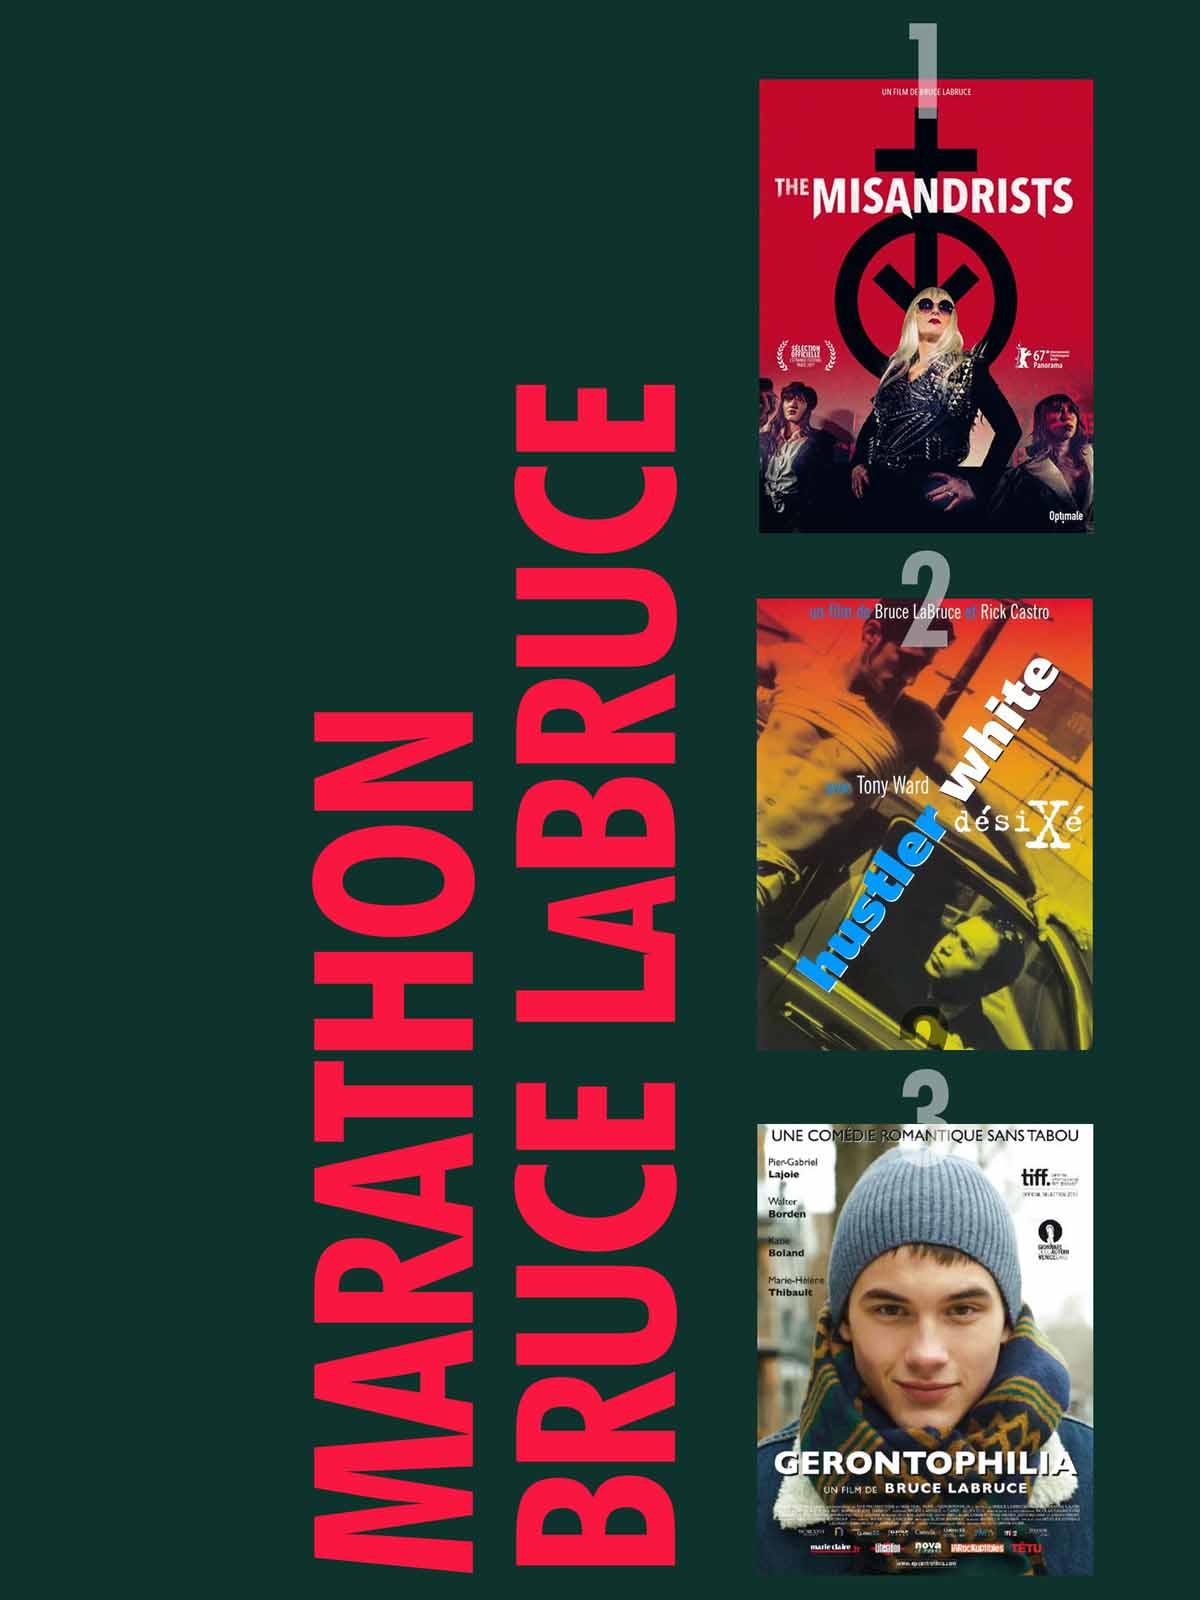 Marathon Bruce LaBruce